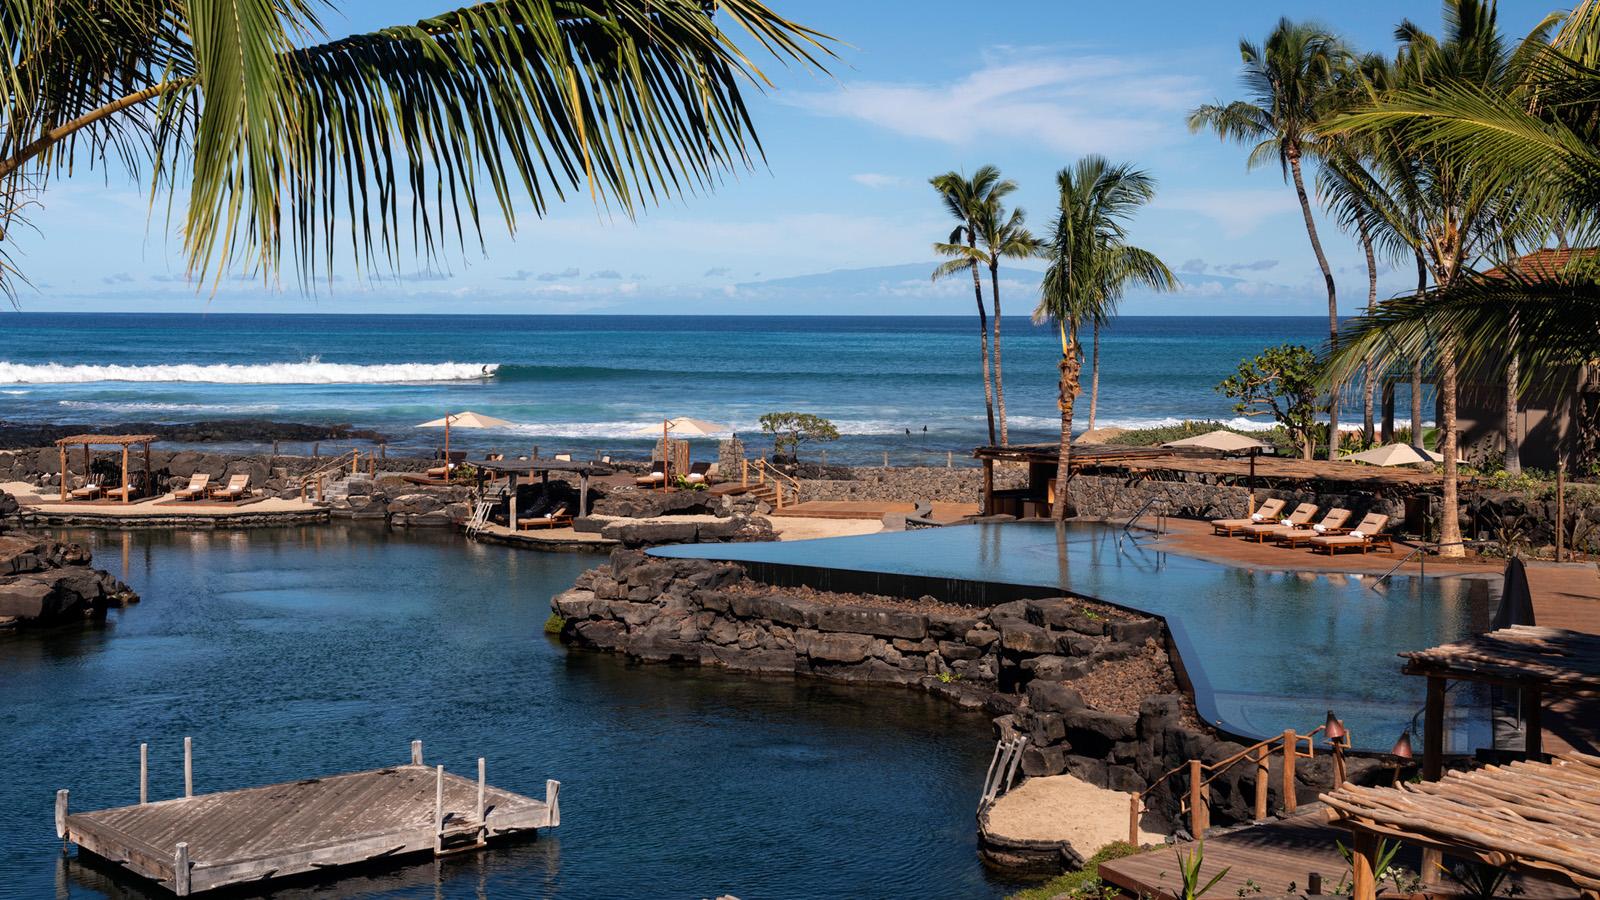 Refreshing Paradise at Four Seasons Resort Hualalai